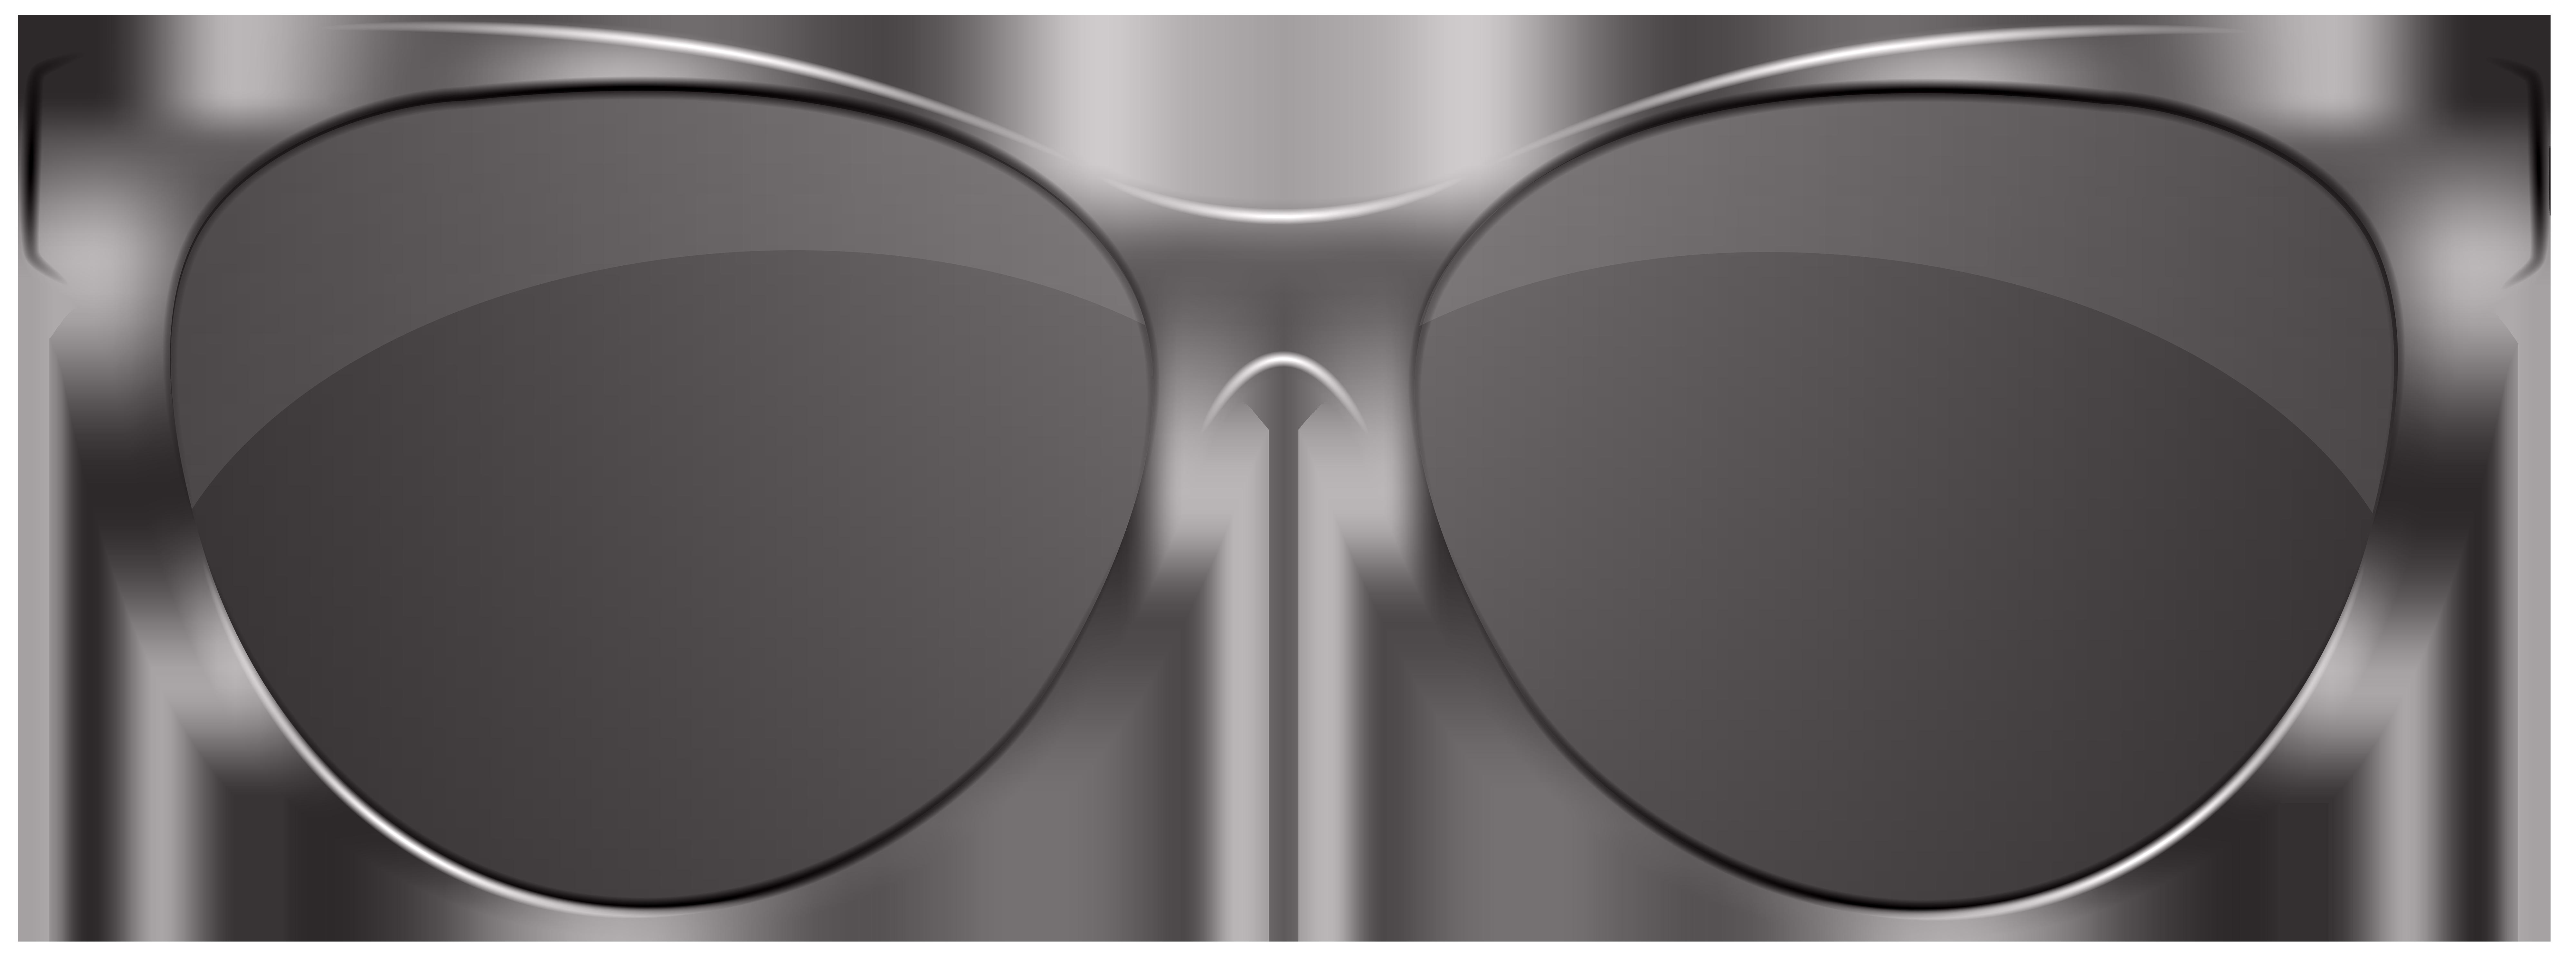 Sunglasses clipart brown. Black png clip art